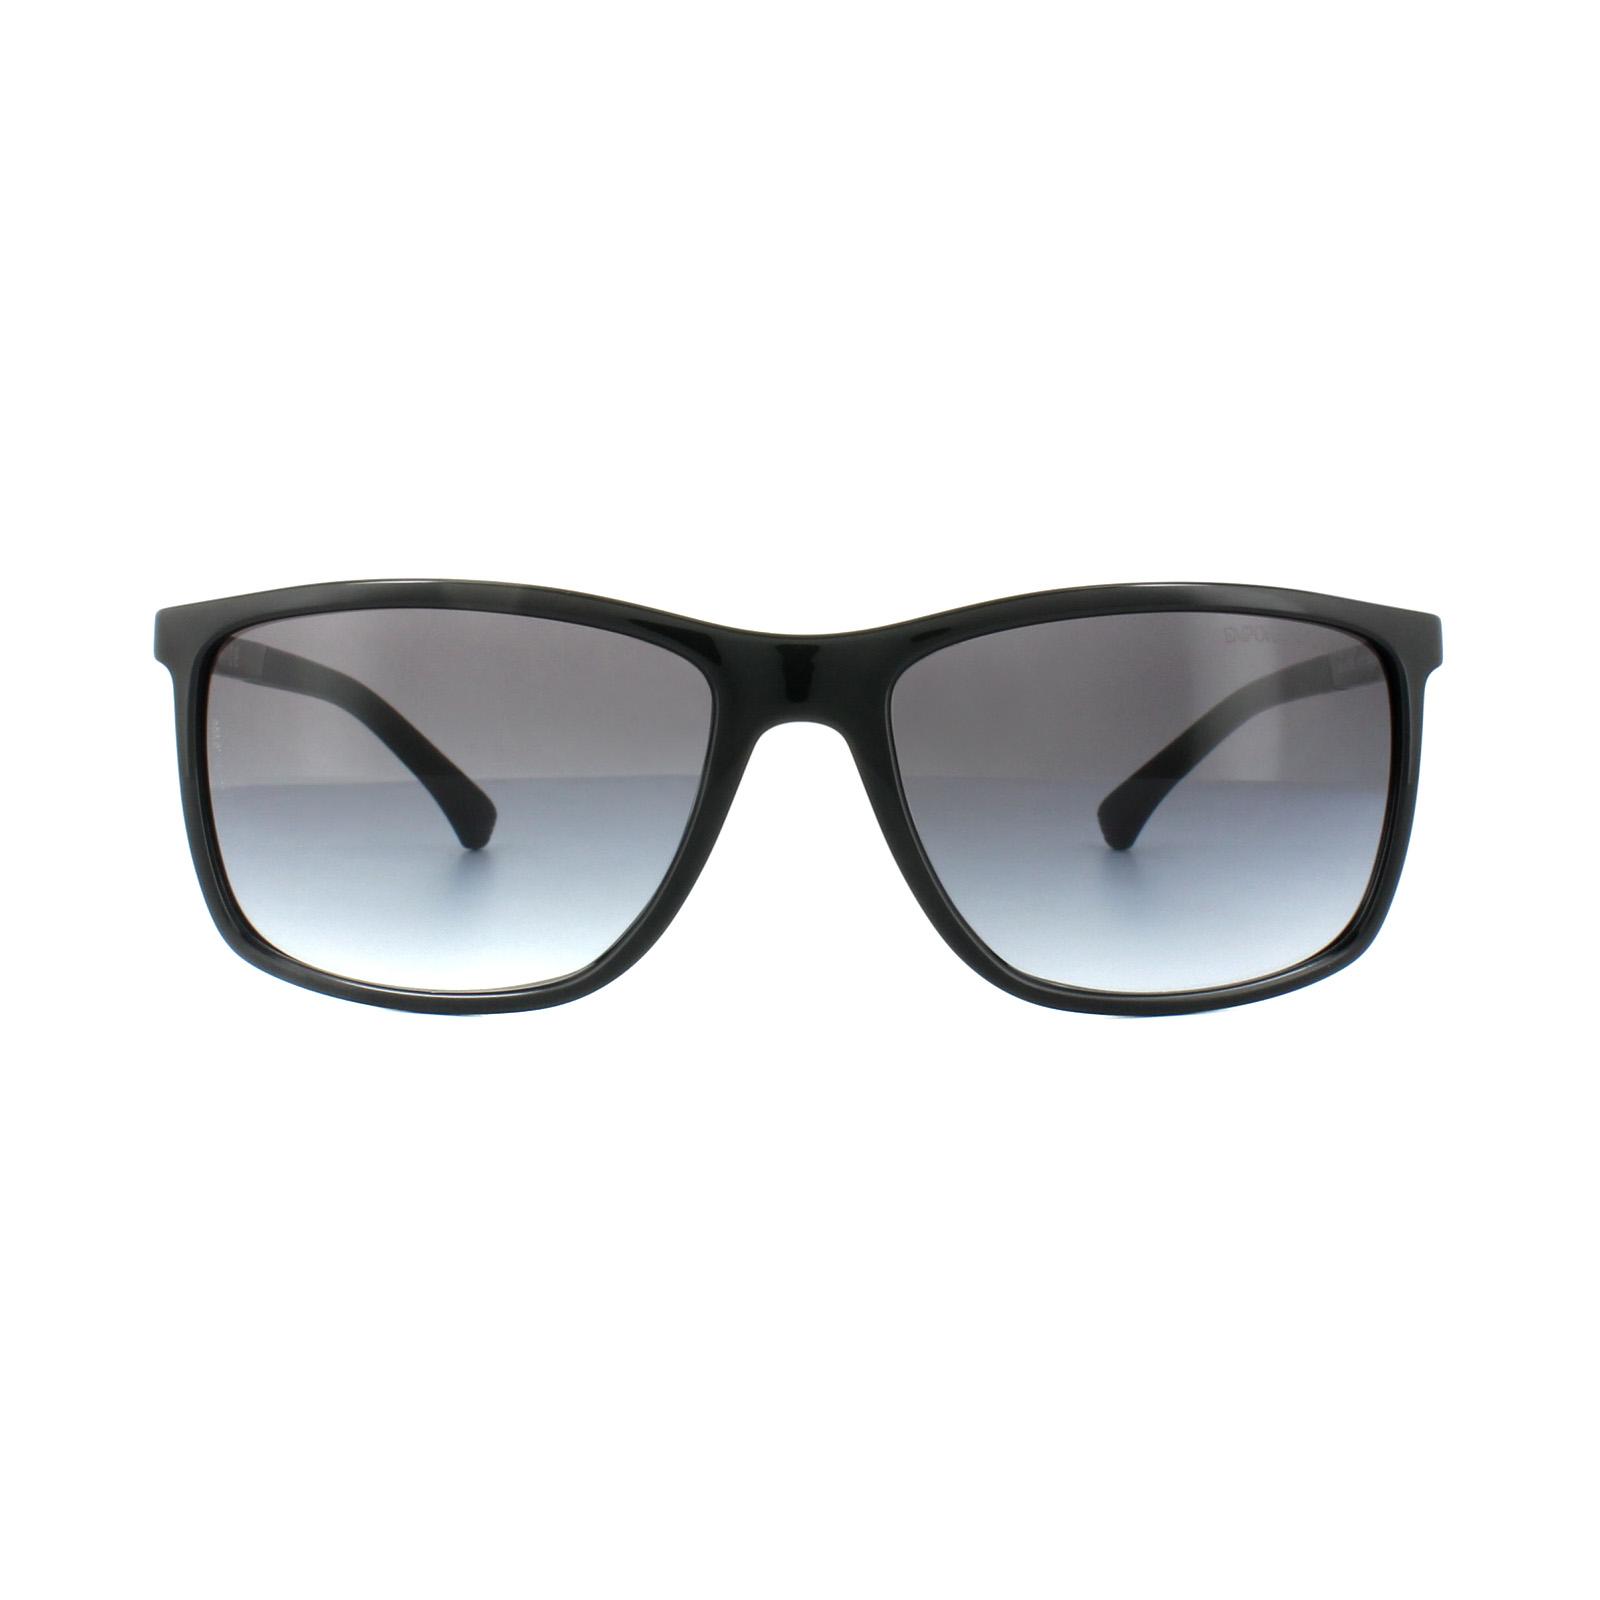 656aa779ead Sentinel Emporio Armani Sunglasses EA4058 5017 8G Black Grey Gradient